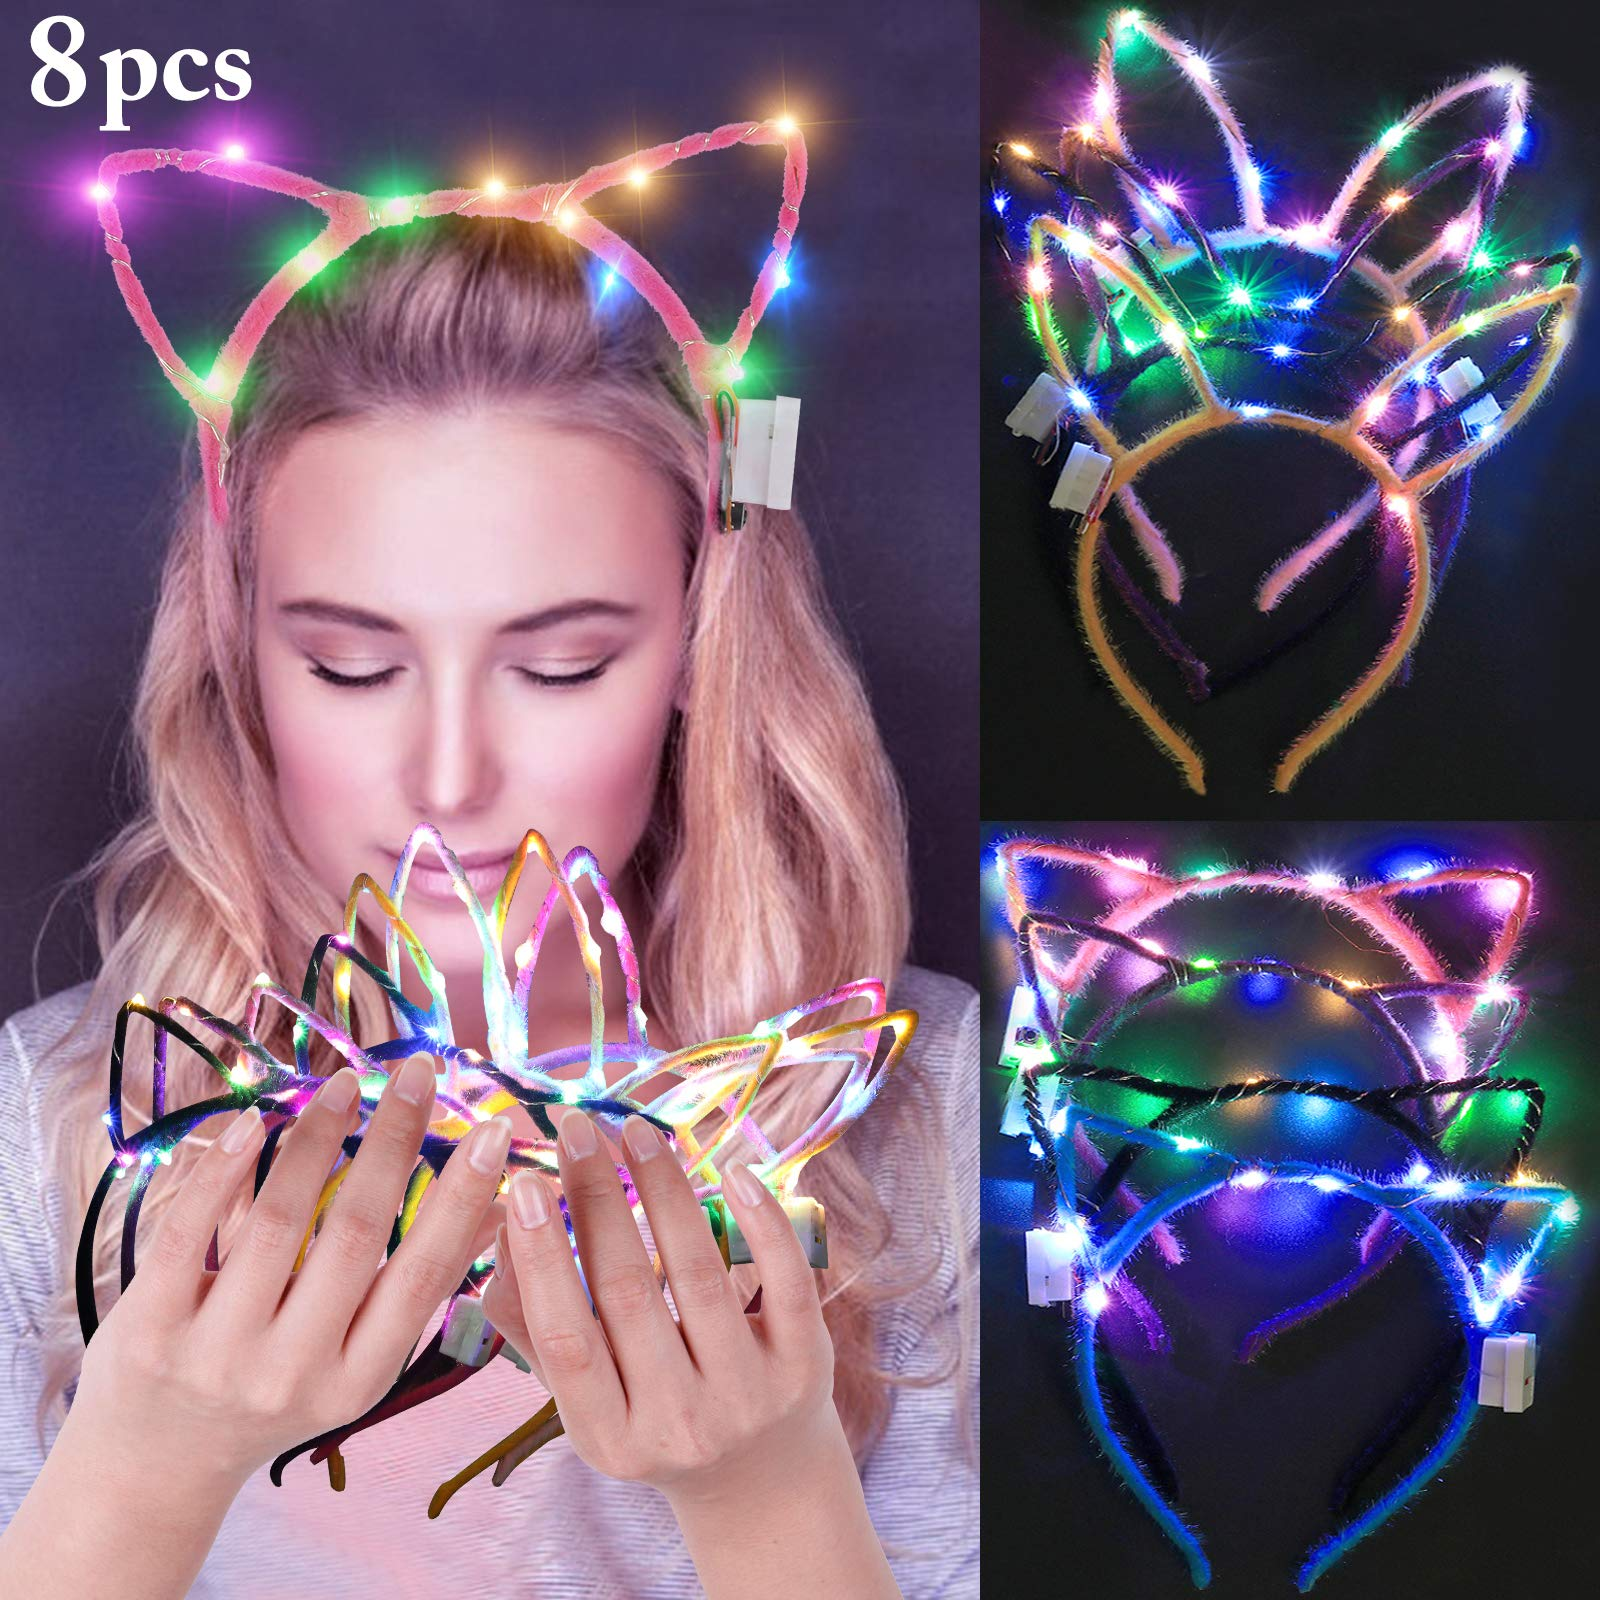 LED Bunny Ear Headband, Fascigirl 8 PCS Light Up Rabbit Ears Cat Ear Headband Cute Hairbands for Girls Adult Halloween Christmas Party Decorations Hair Accessories by Fascigirl